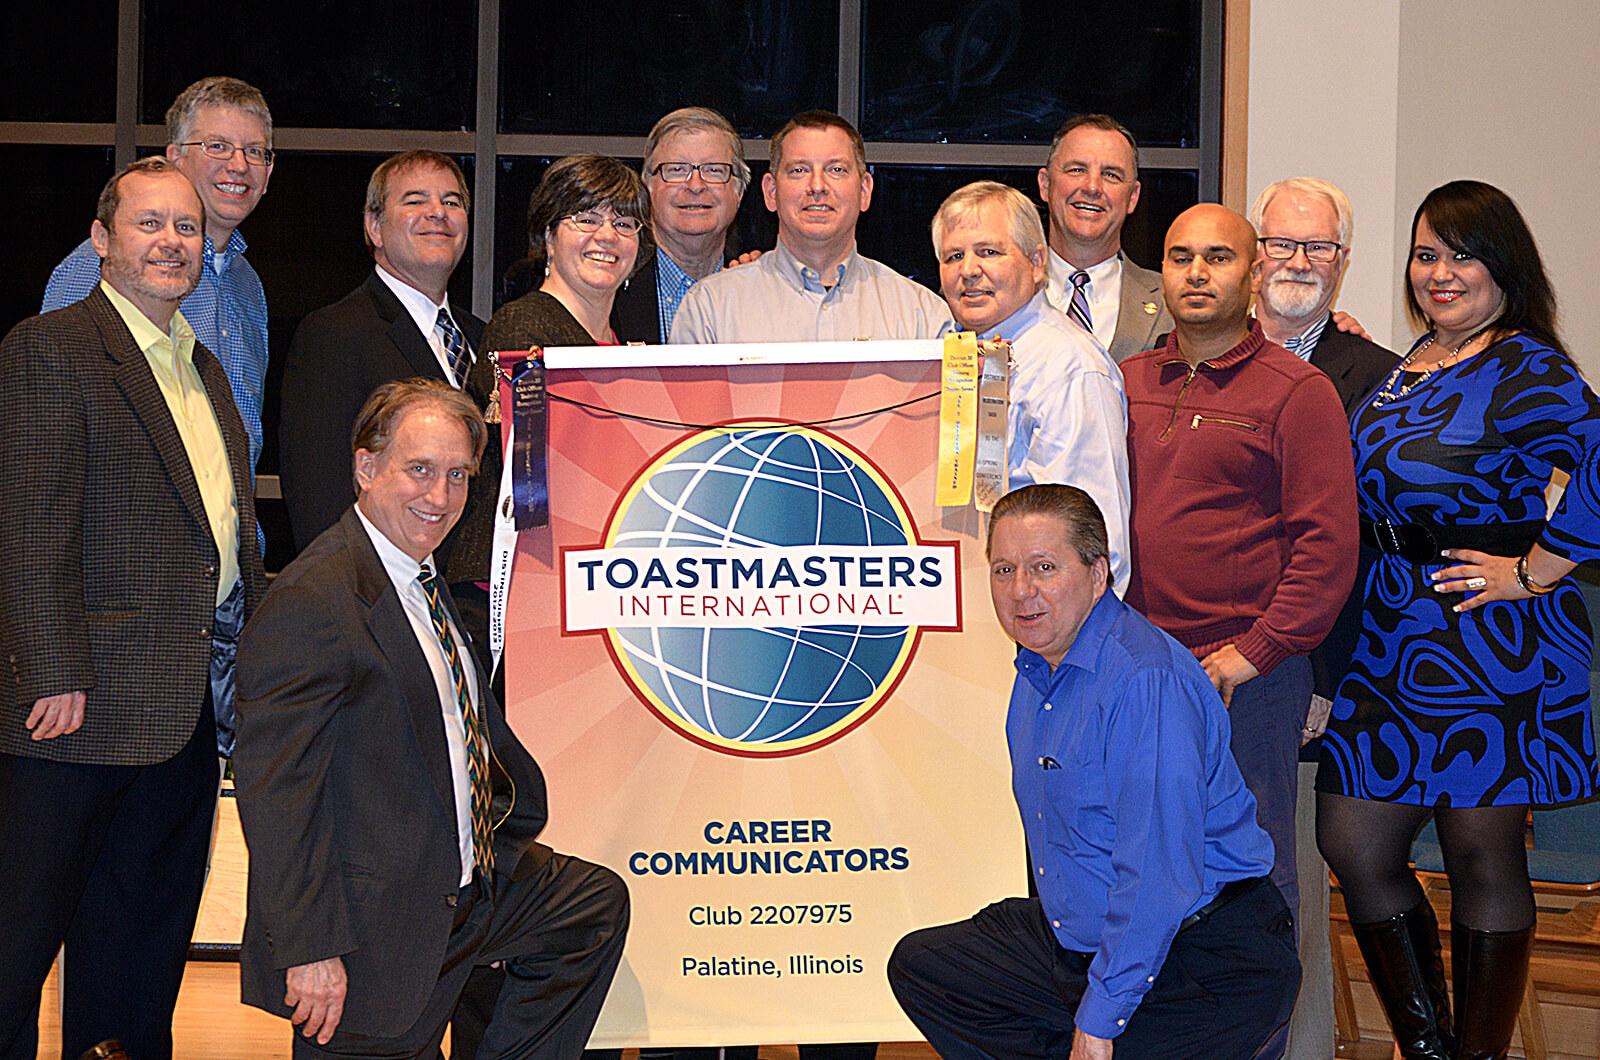 The Career Communicators of Palatine, Illinois, celebrate the club's 5-year anniversary.